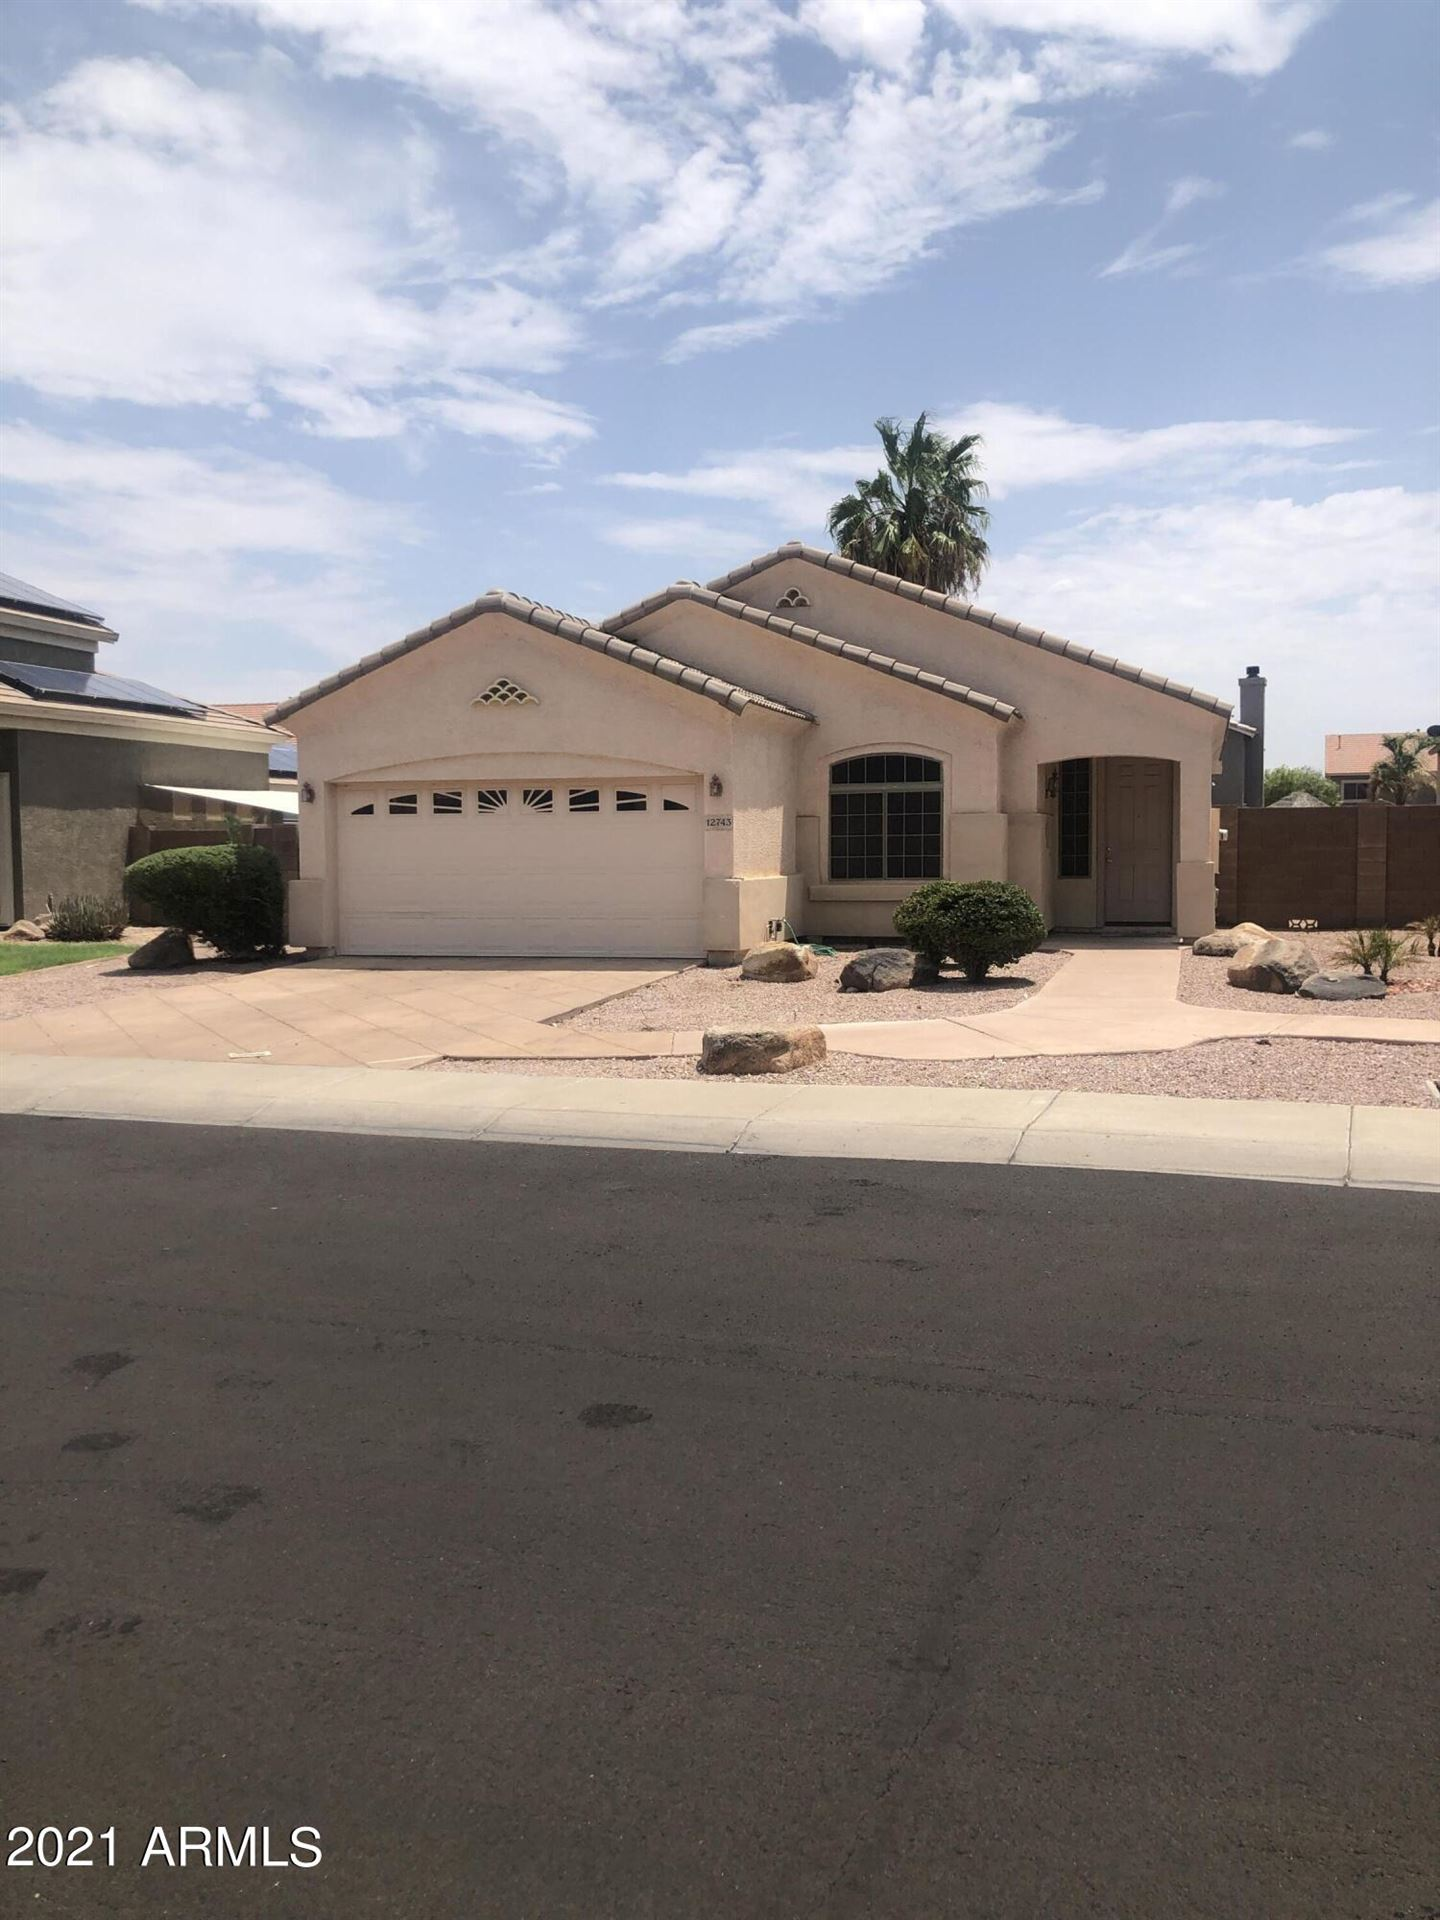 Photo of 12743 W Merrell Street, Avondale, AZ 85323 (MLS # 6266182)